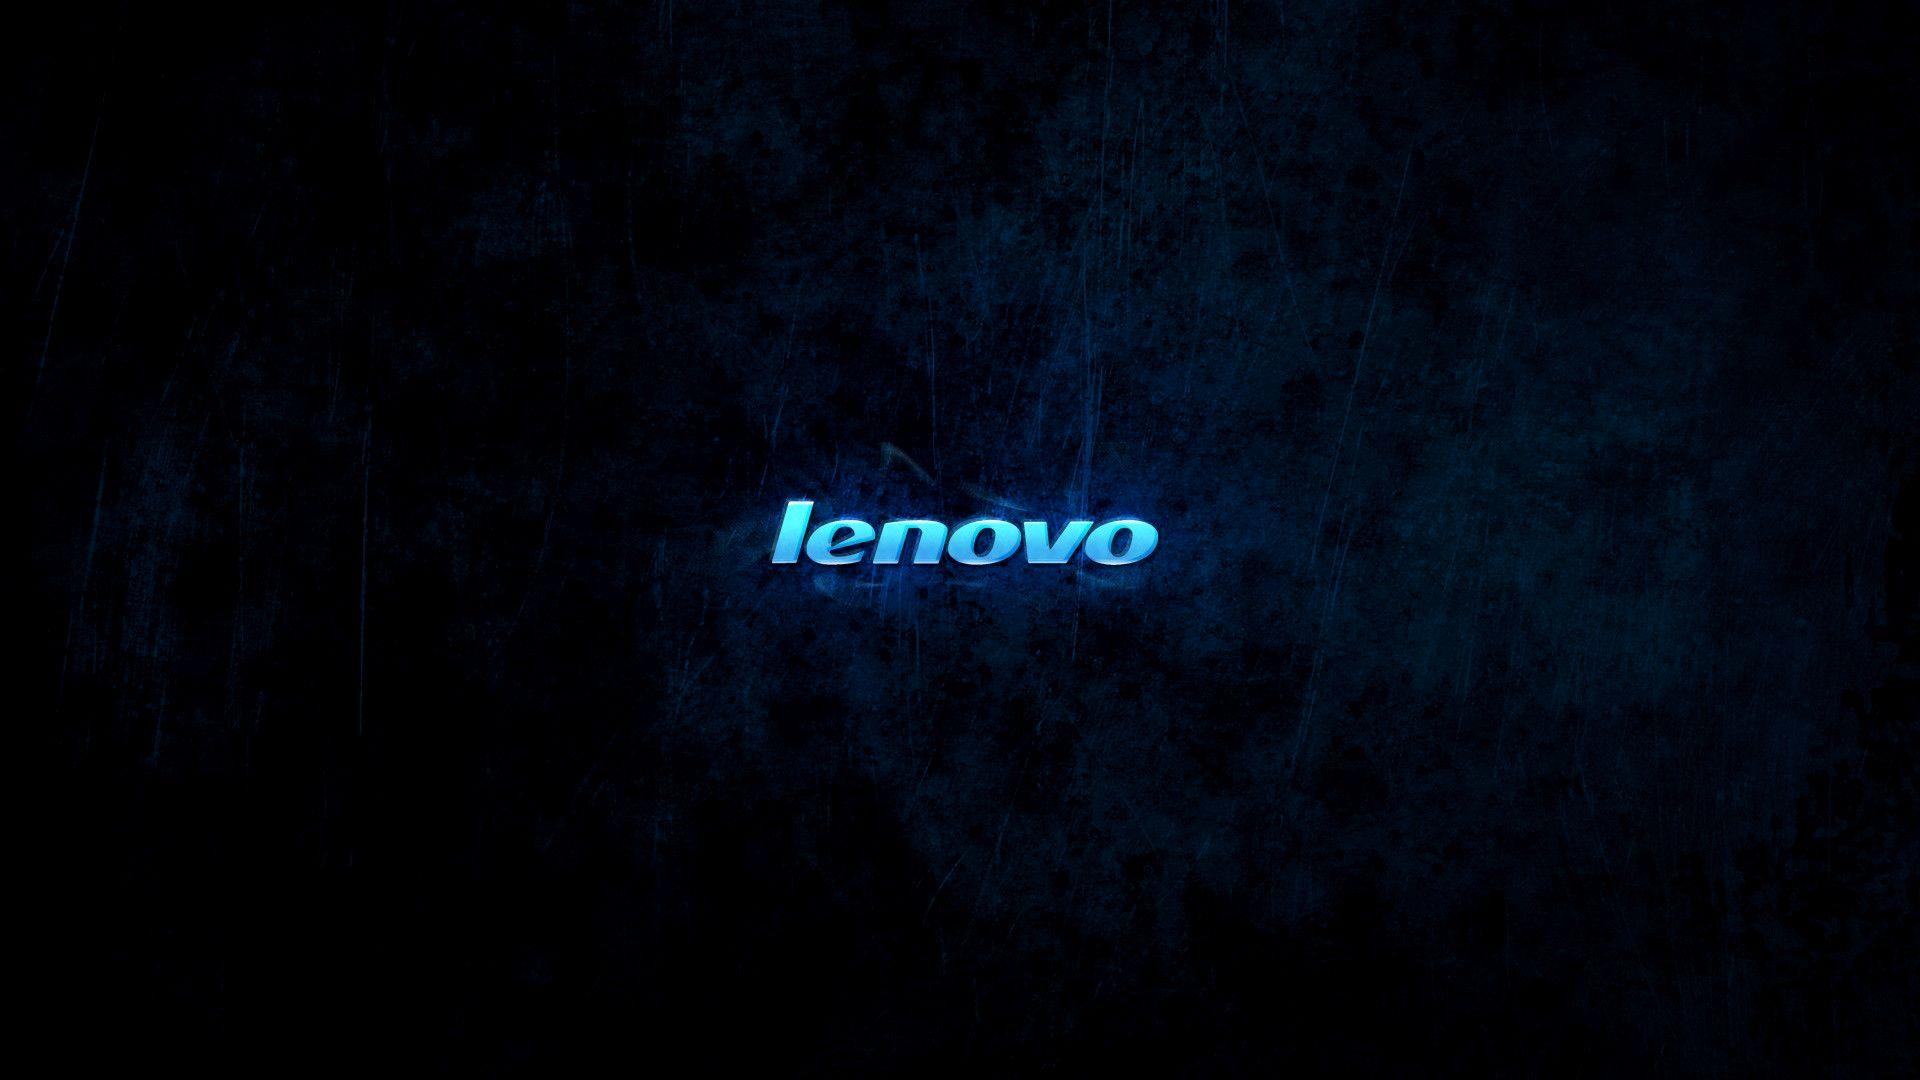 Lenovo Gaming Wallpaper 4k Gallery Lenovo Wallpapers Lenovo Gaming Wallpapers